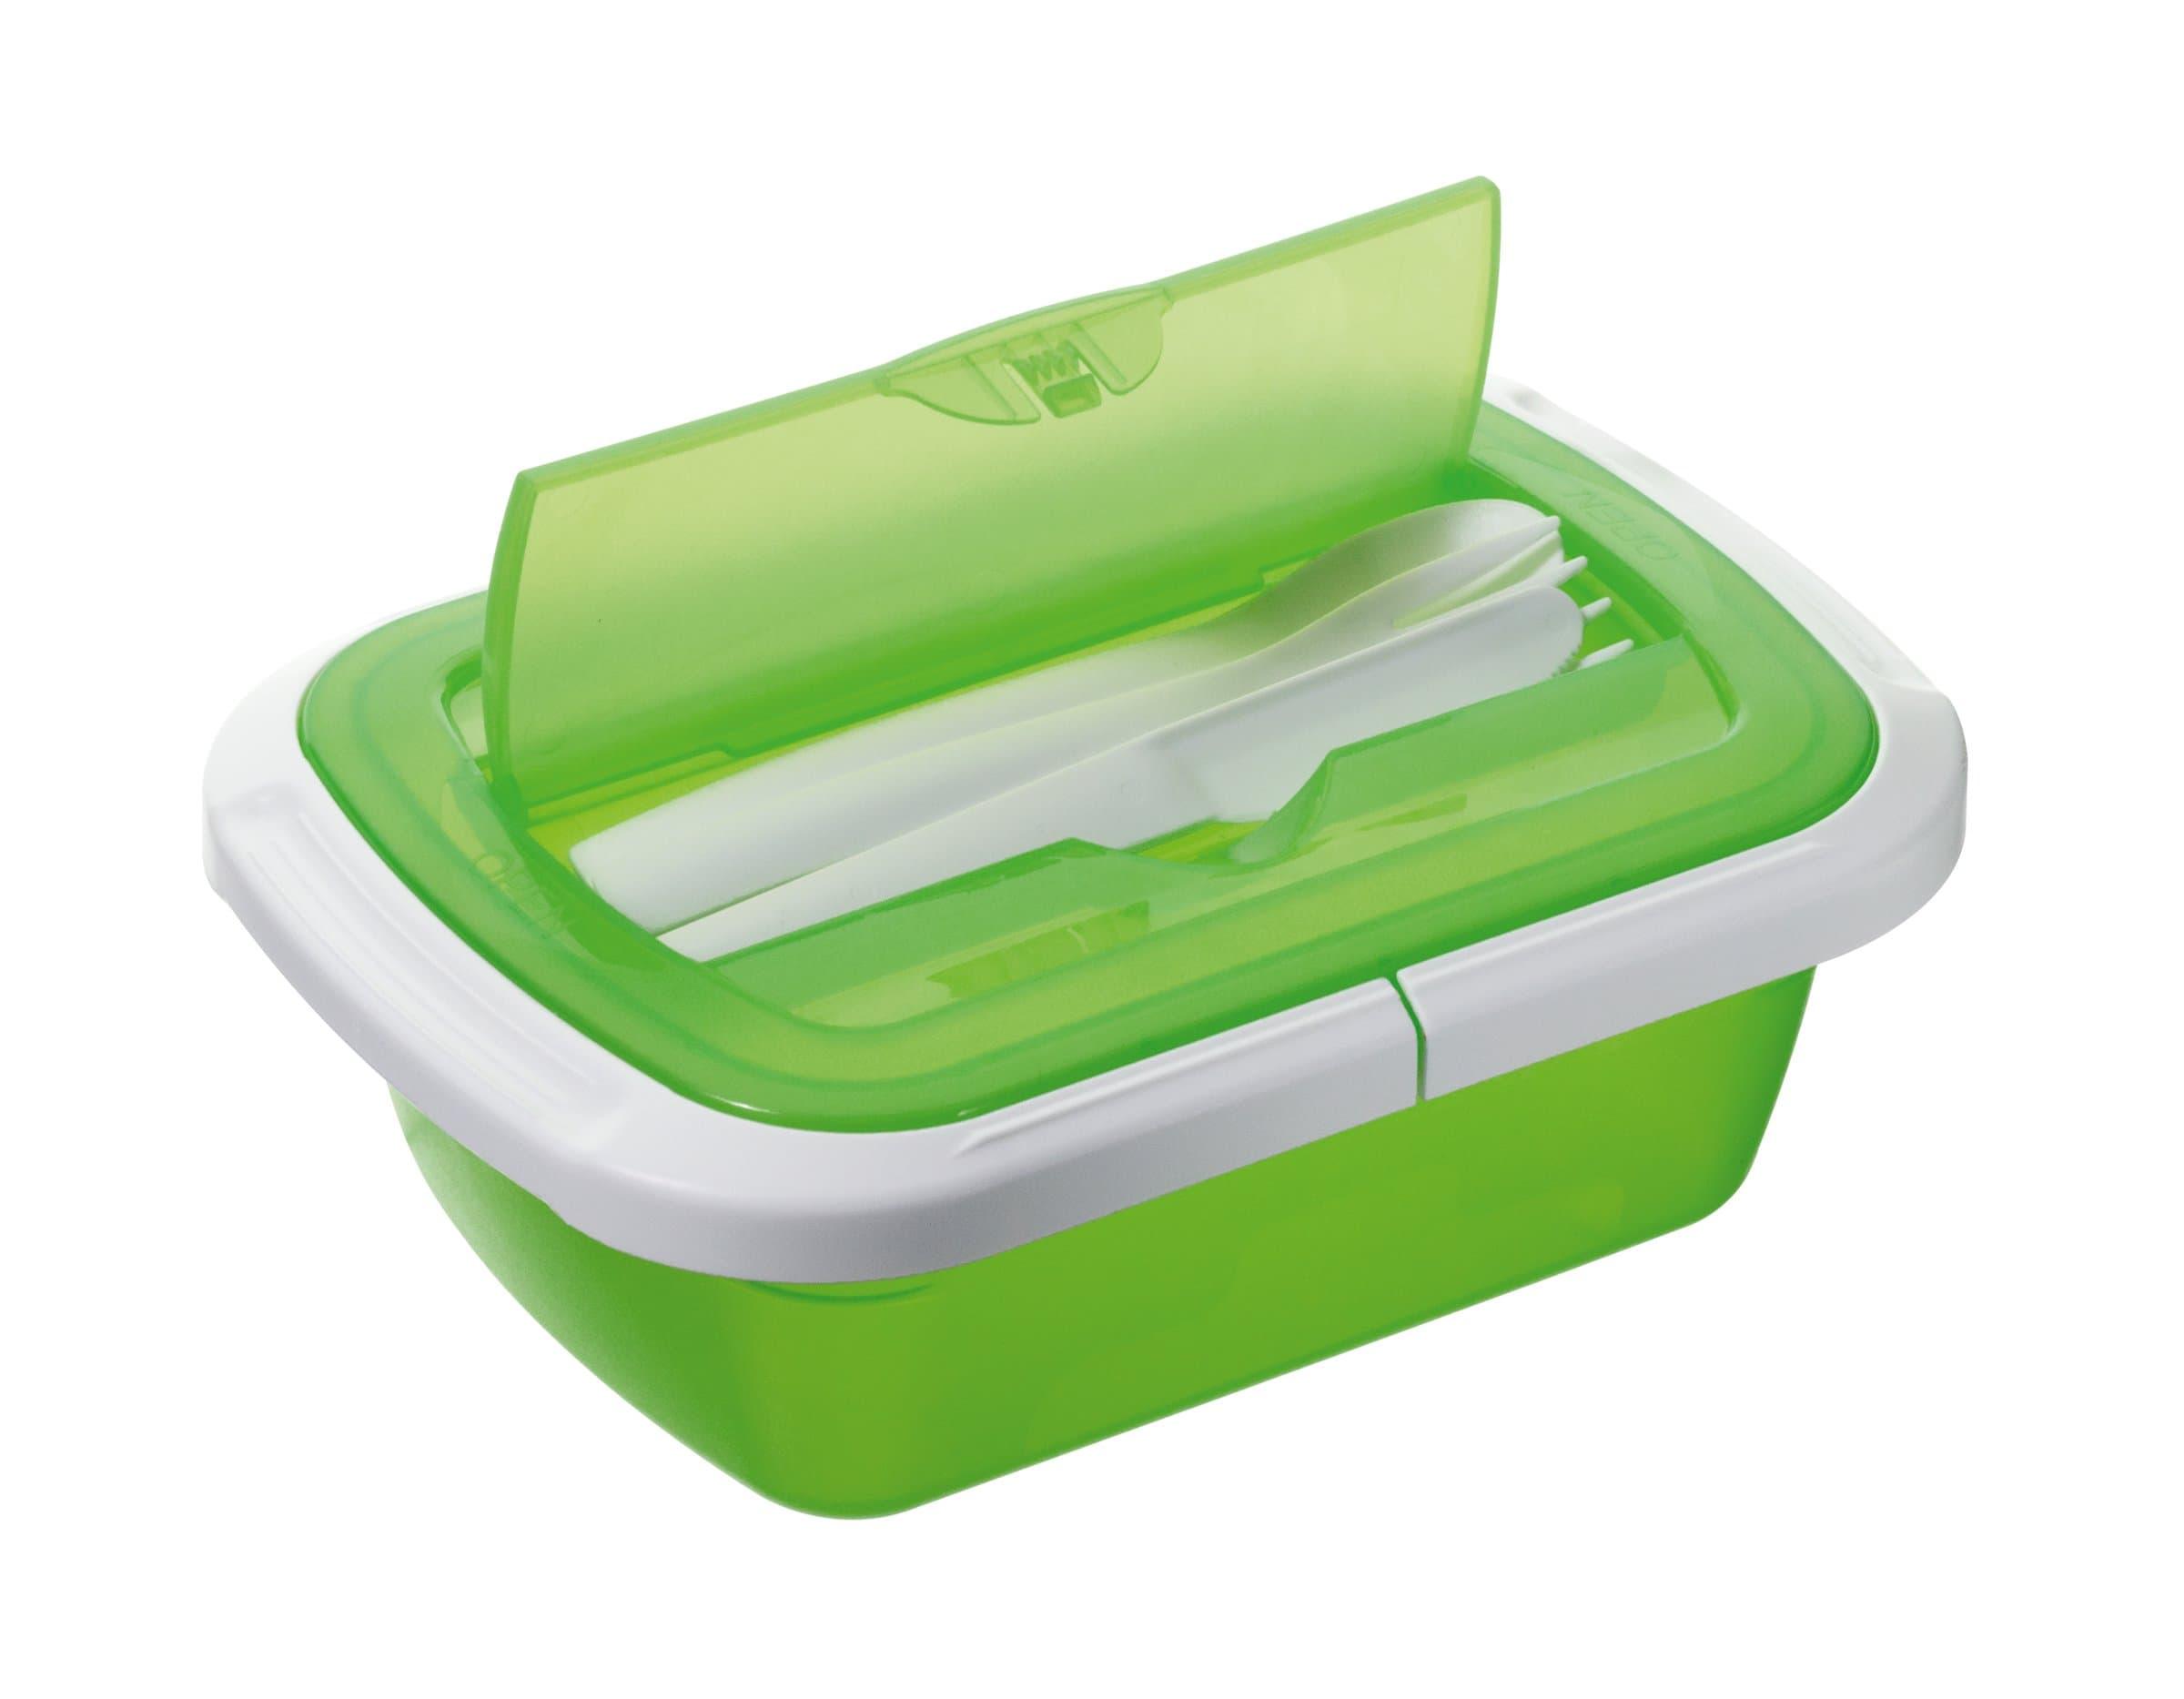 M-Topline TAKE AWAY Snackbox 1.0L Snackbox 1,0 l